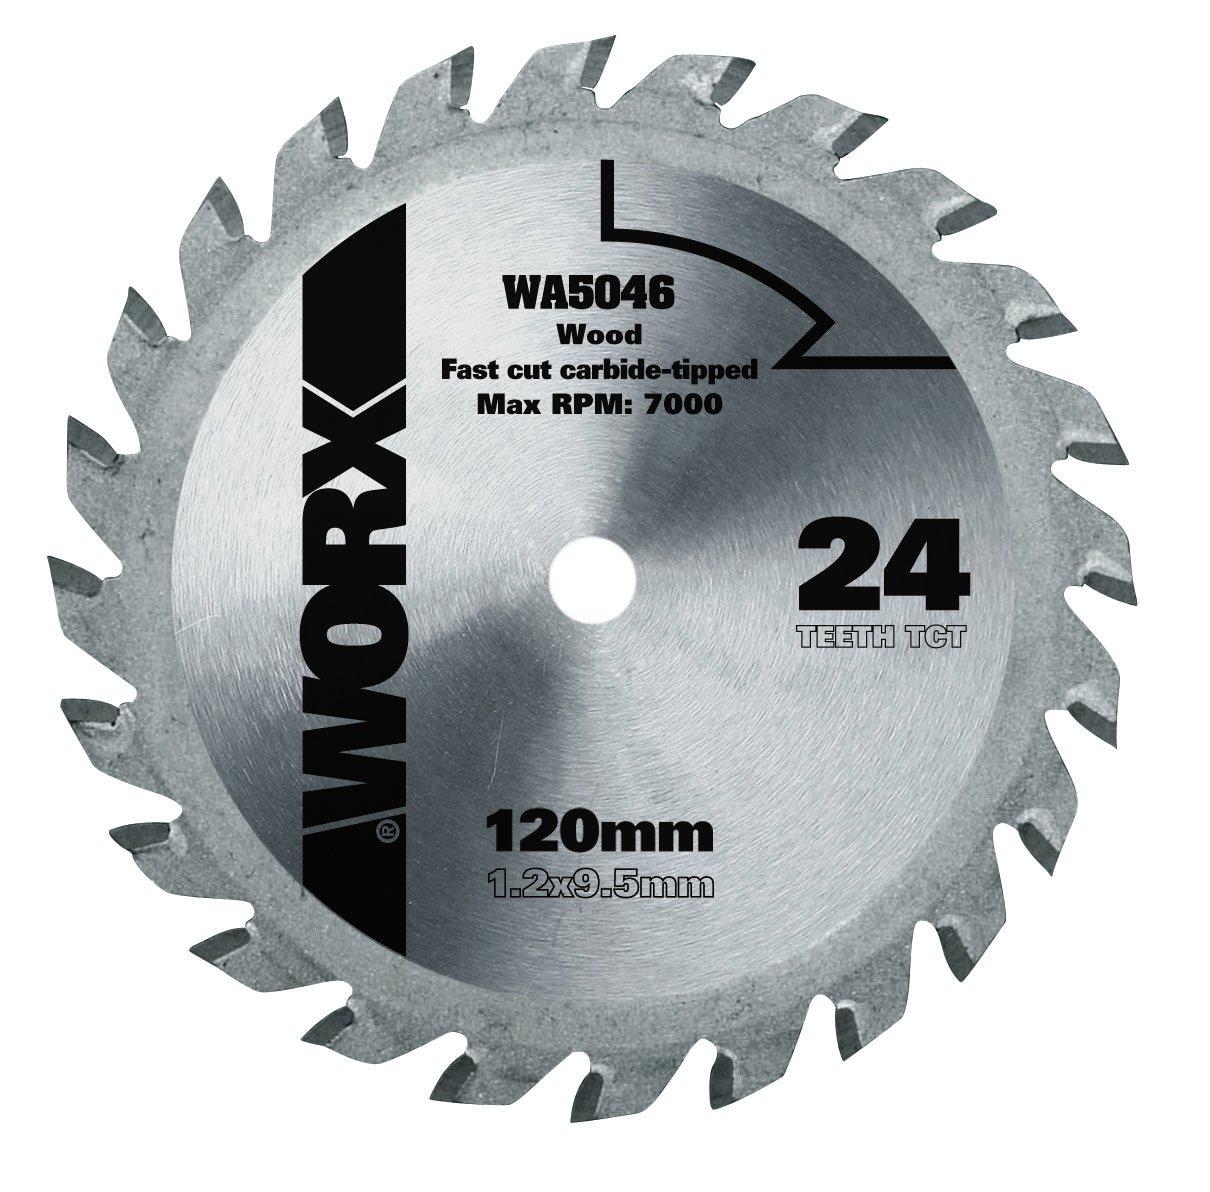 Worx WA5046 - bû cheron 120mm XL WorxSaw